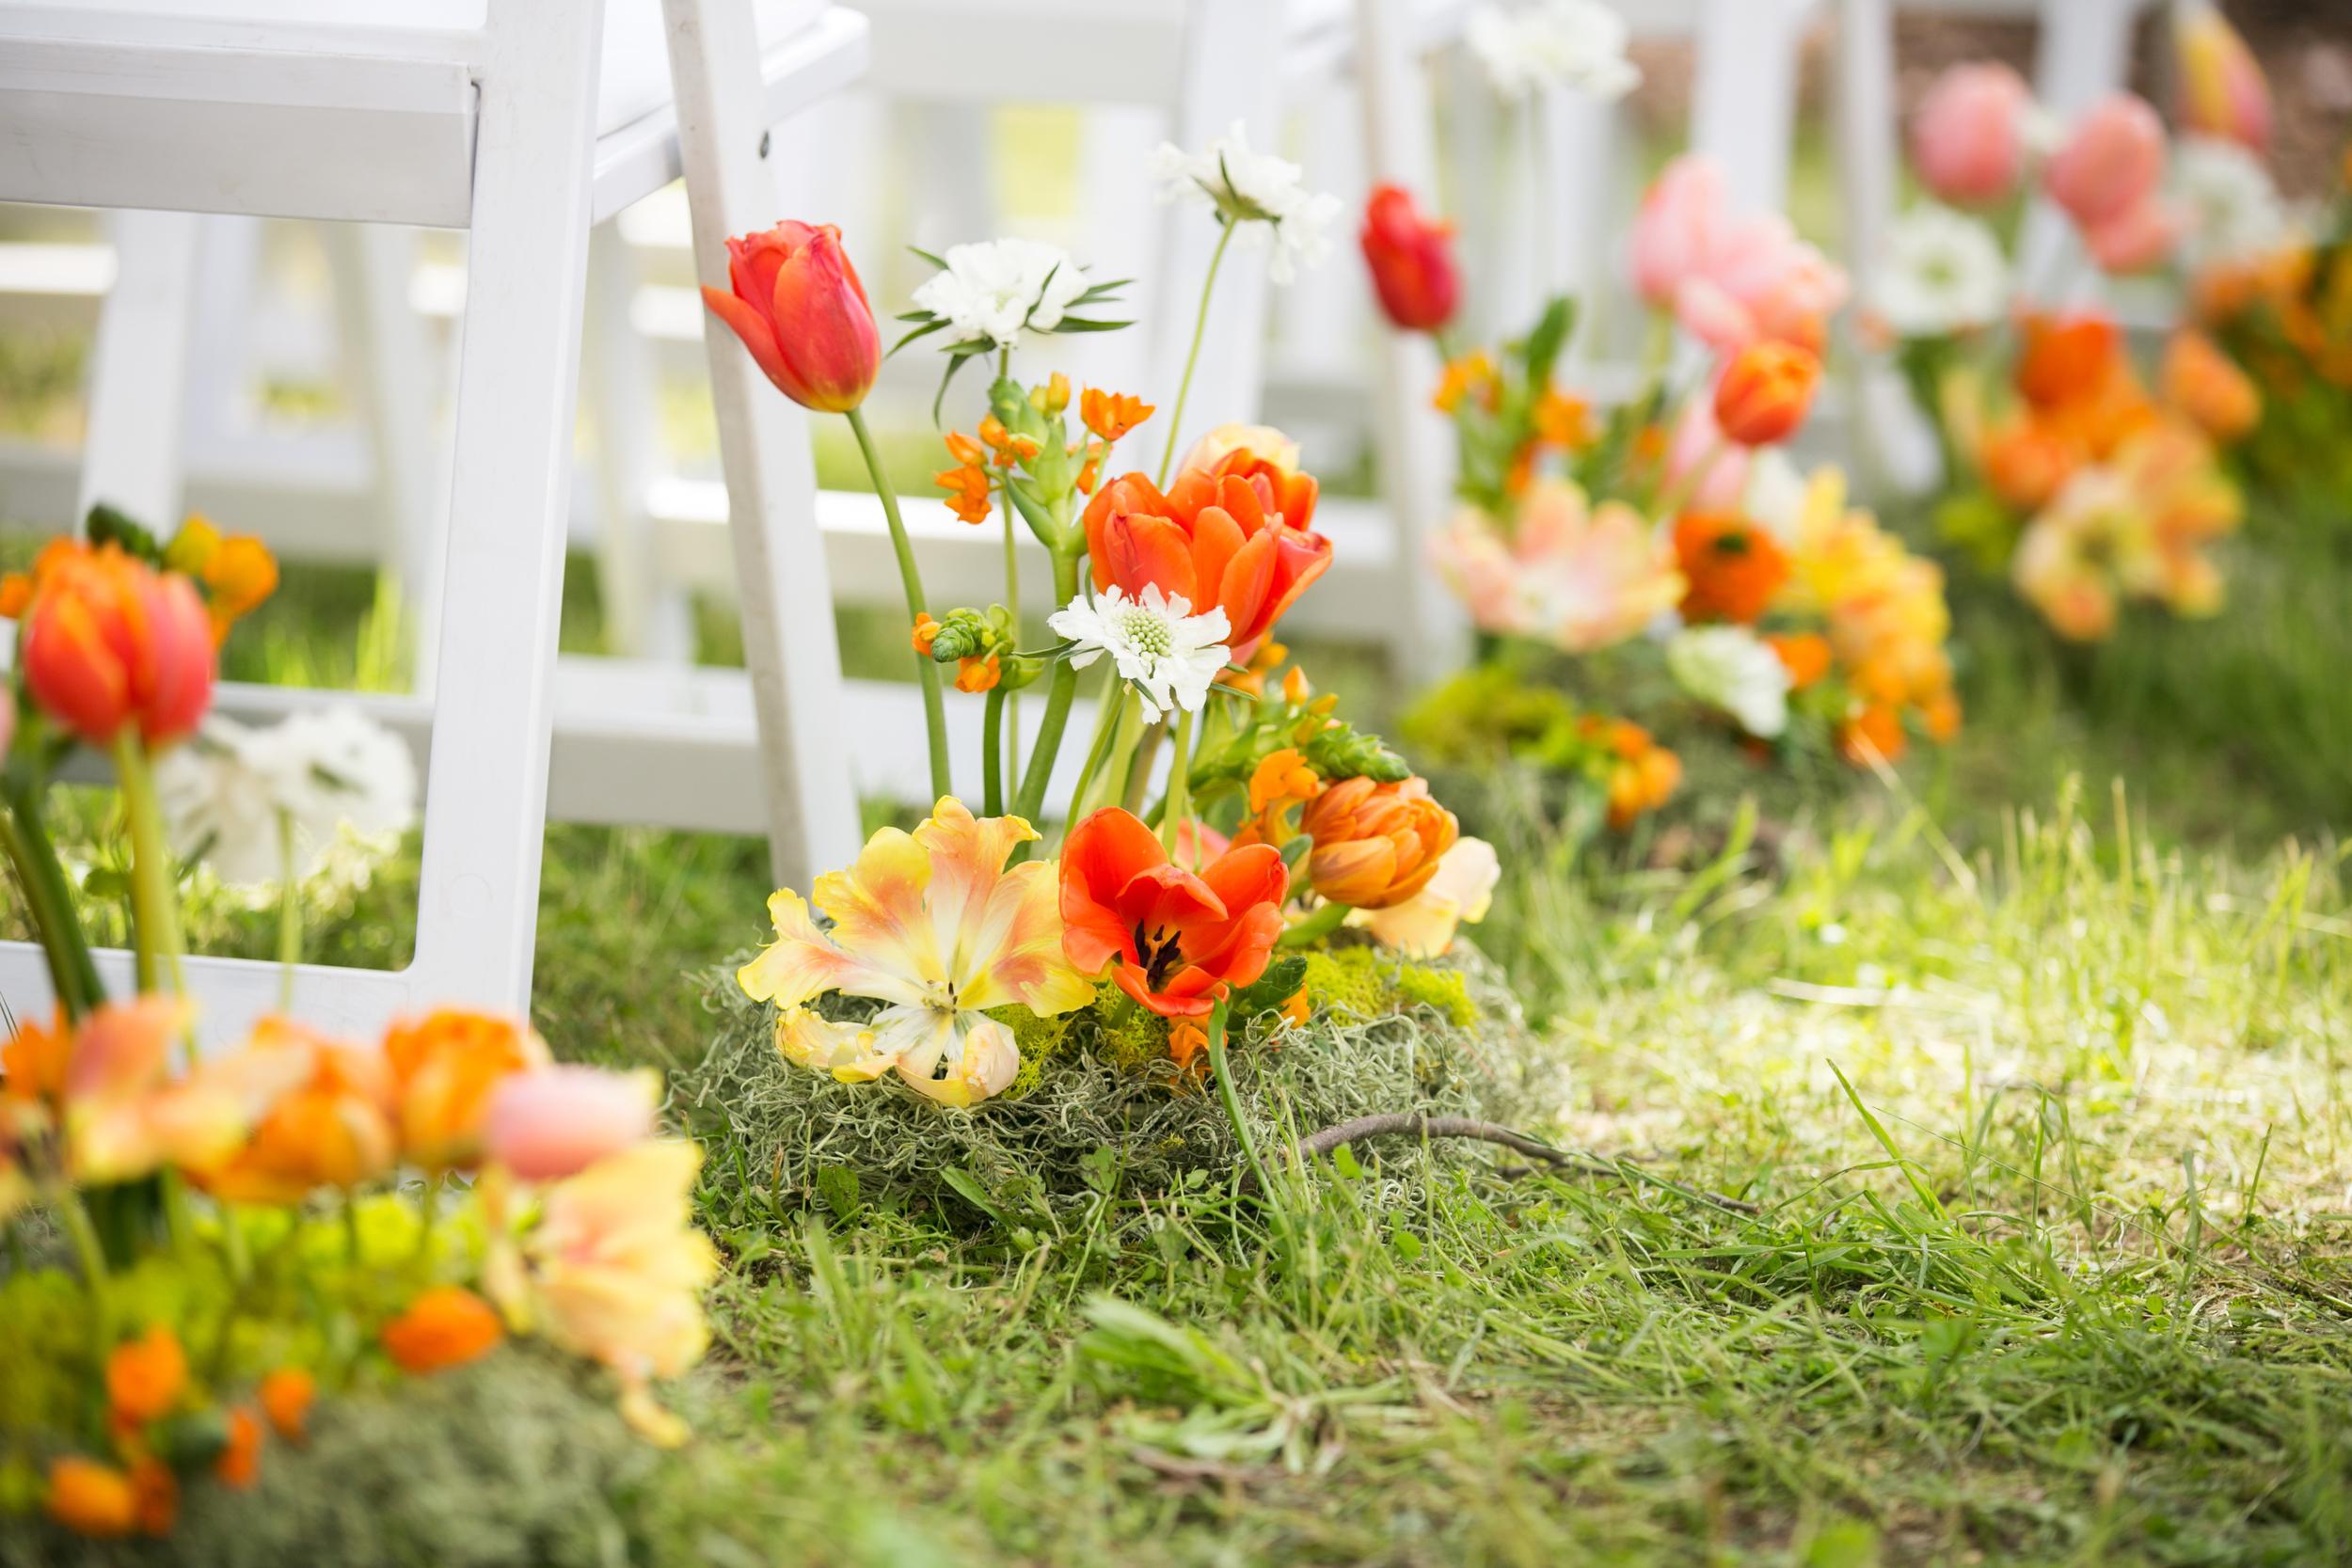 campovida-ceremony-tulip-wedding-aisle.jpg